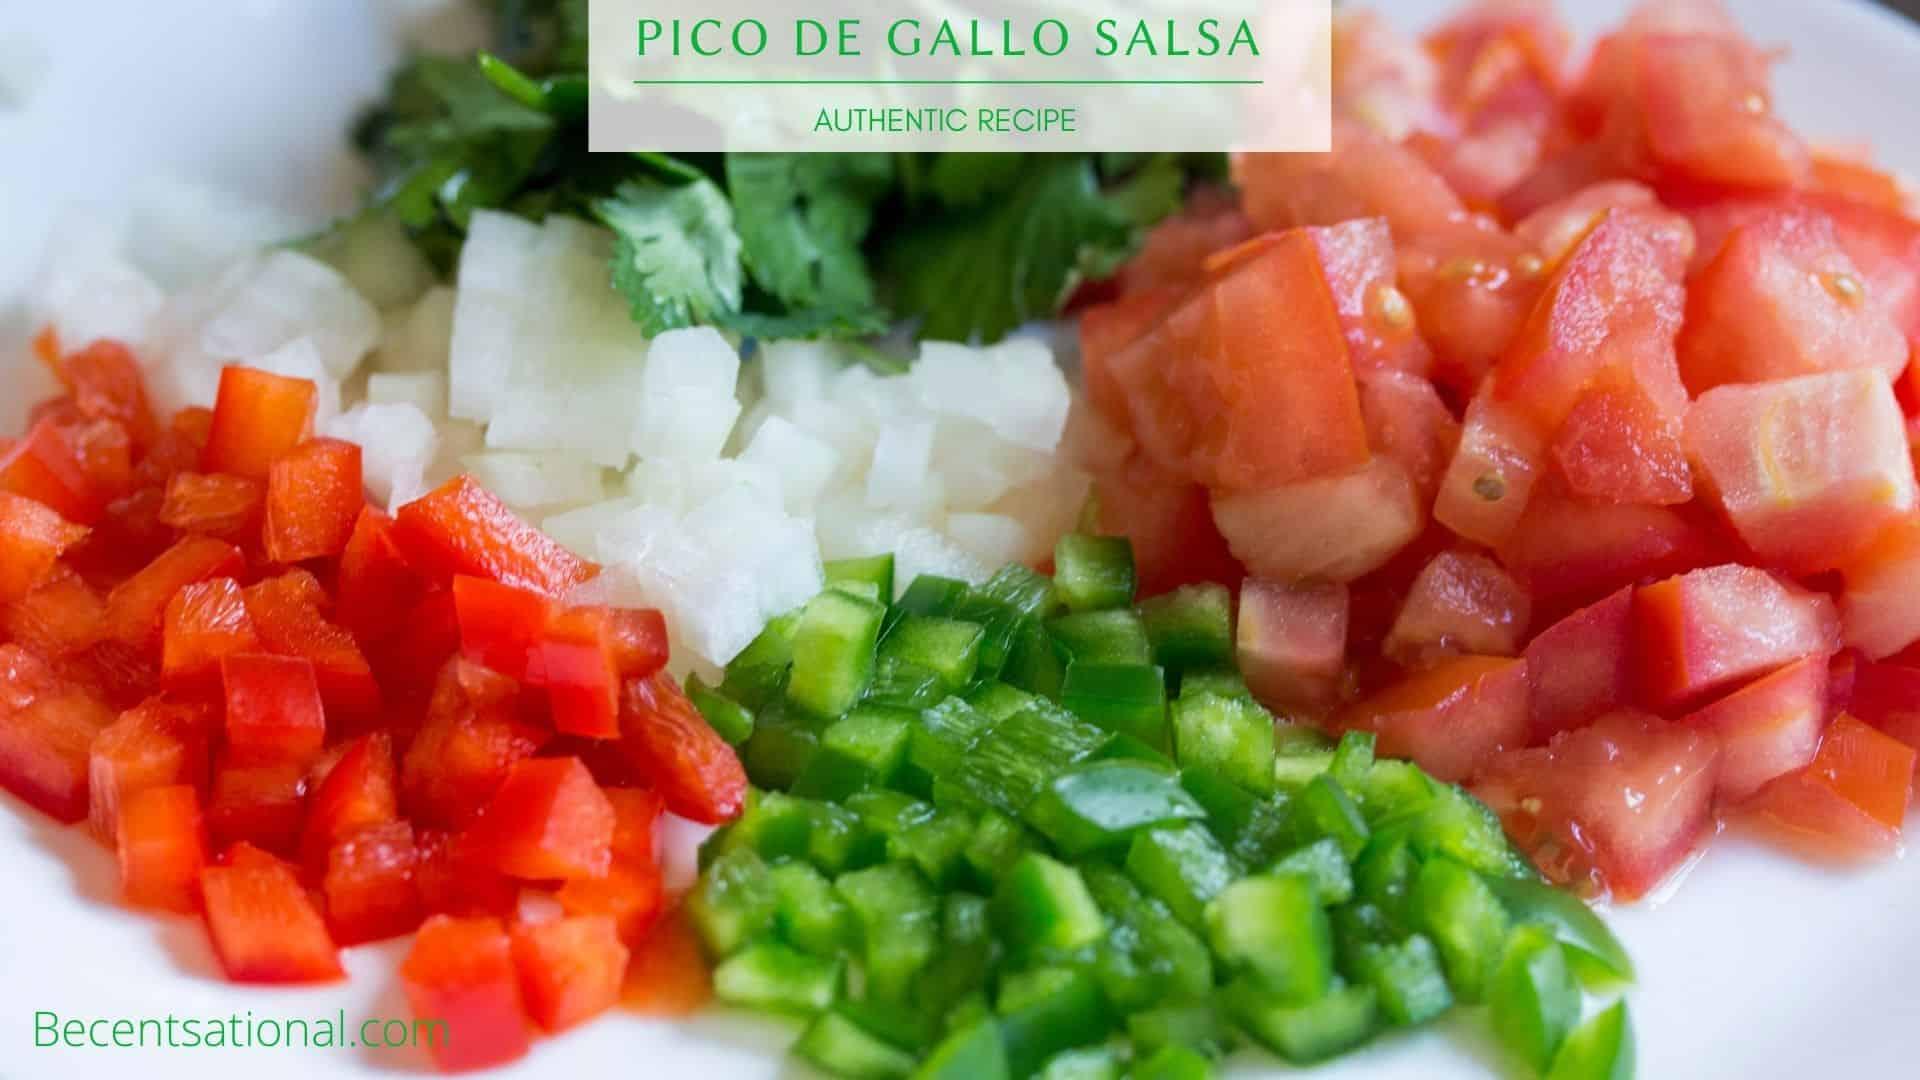 Pico de gallo salsa chopped ingredients